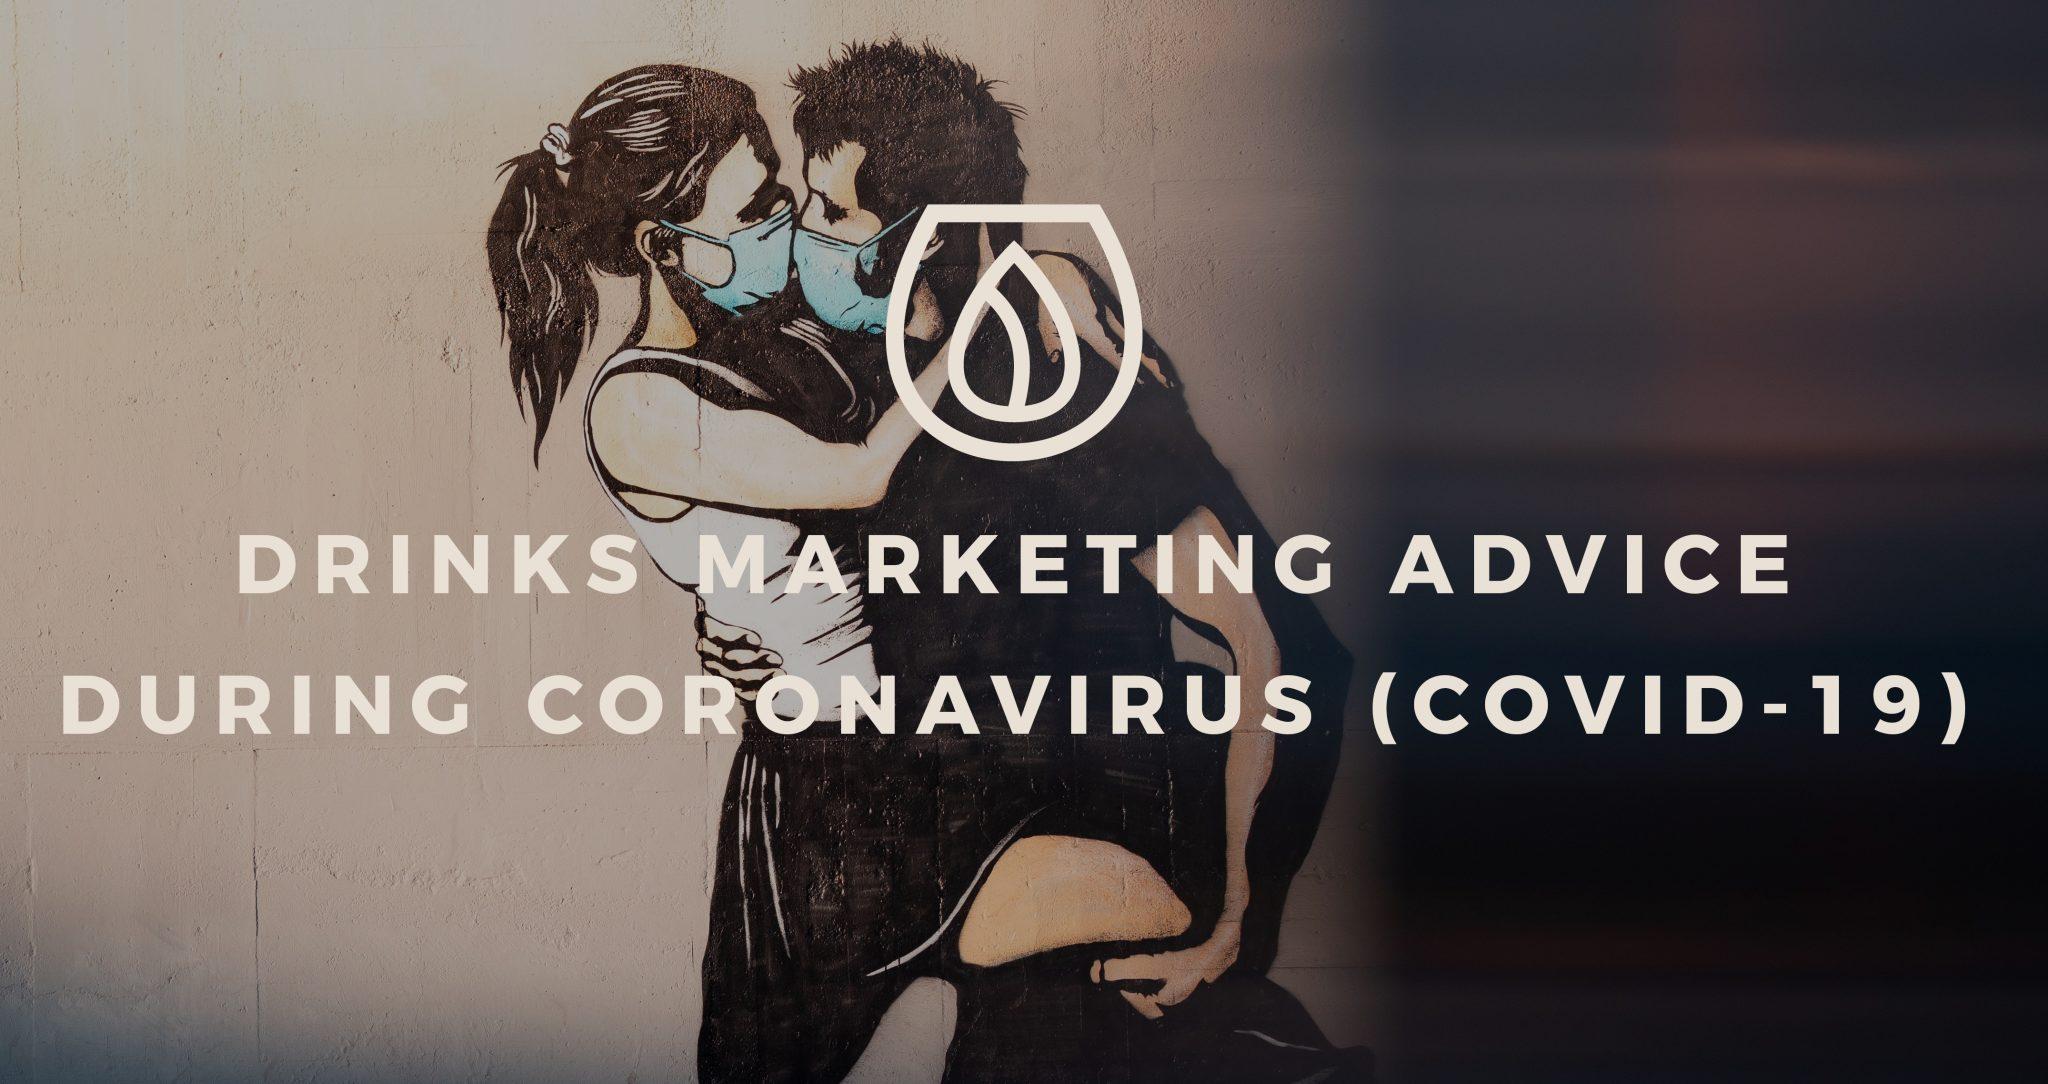 Drinks Marketing Advice during Coronavirus (COVID-19) by YesMore drinks marketing agency